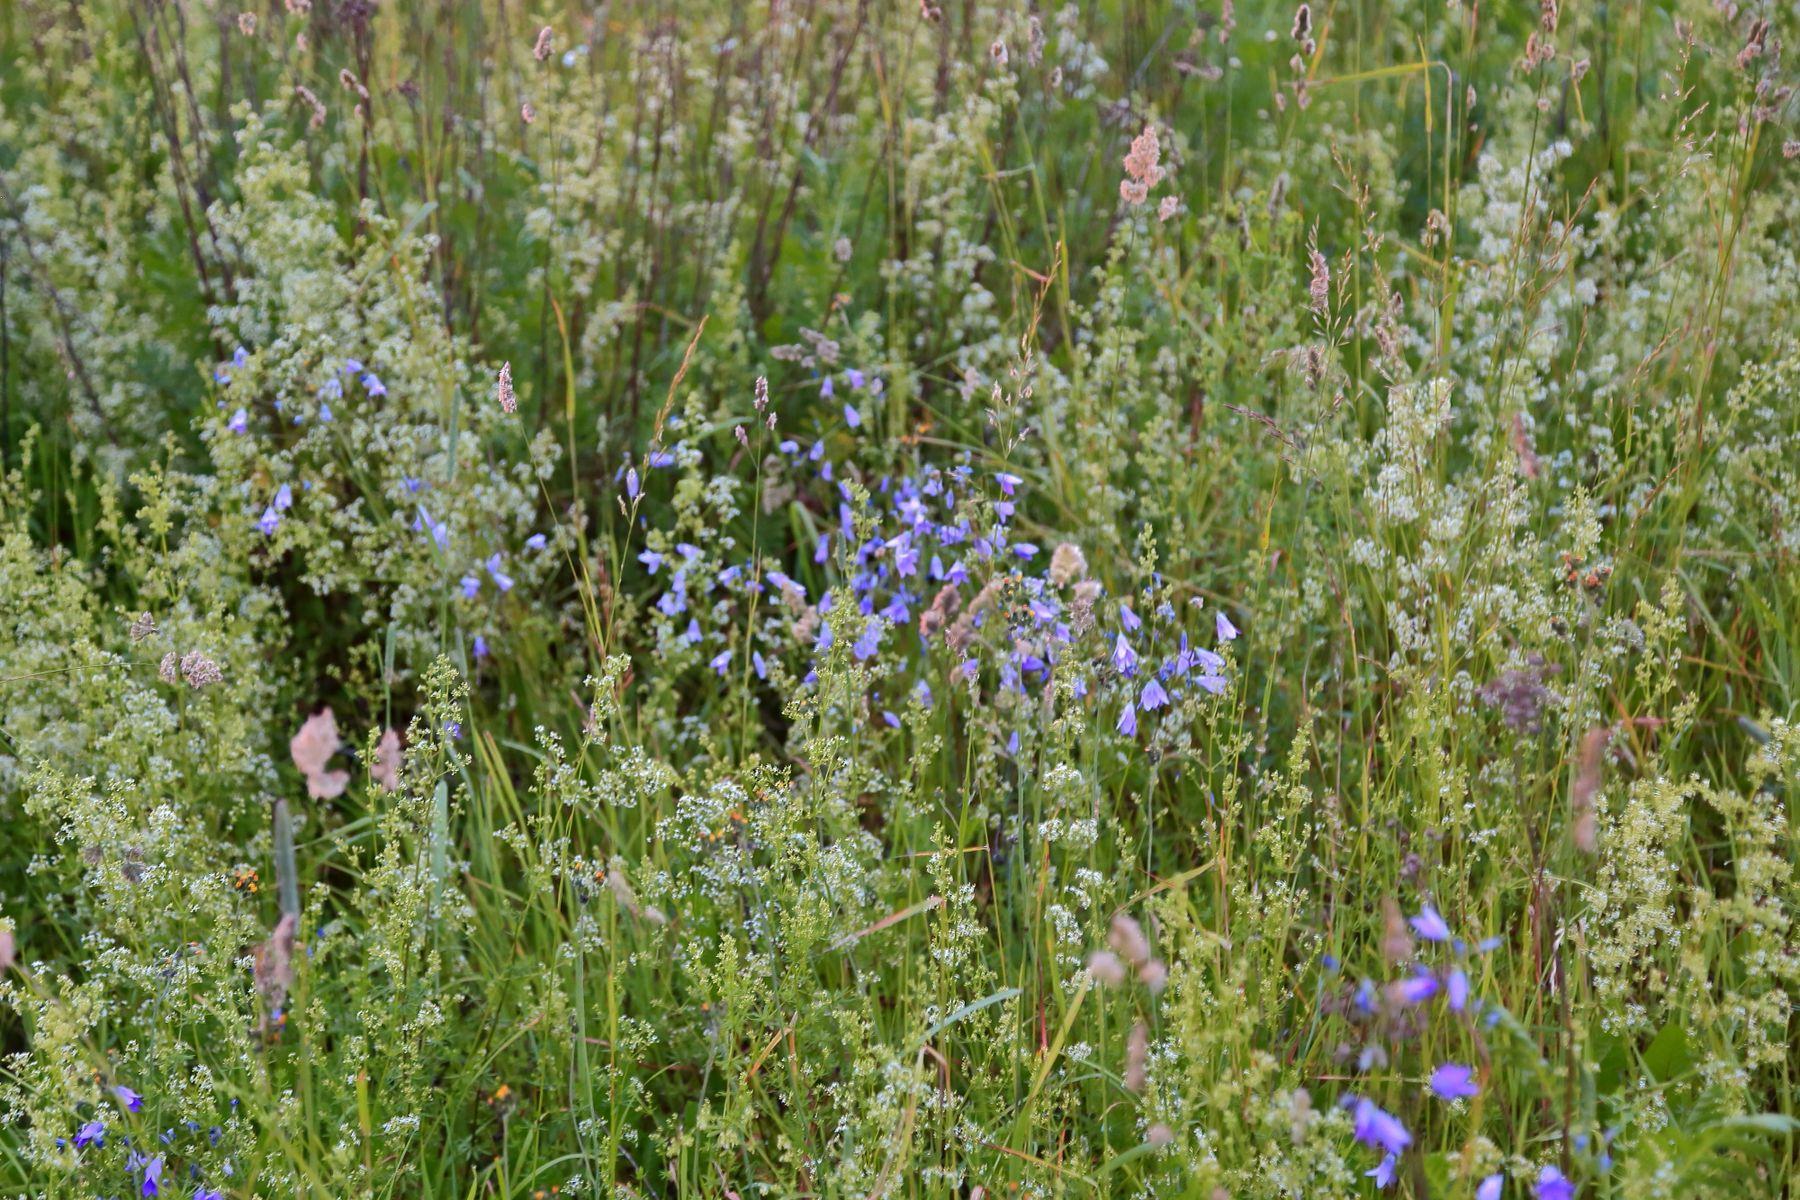 Полевые цветы лето поле цветы закат